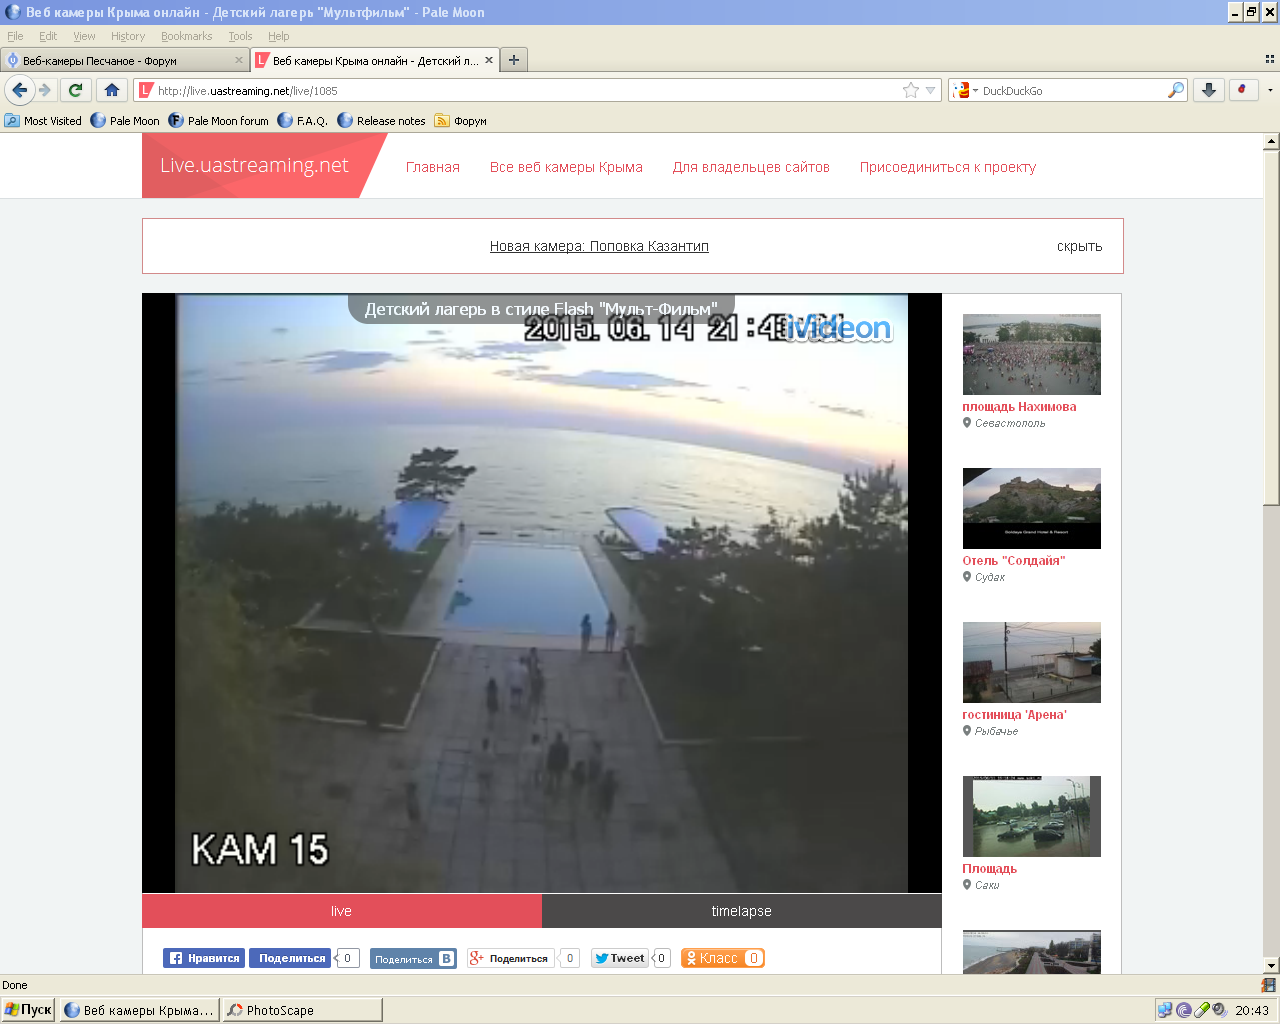 веб камера смотрит онлайн-хв7